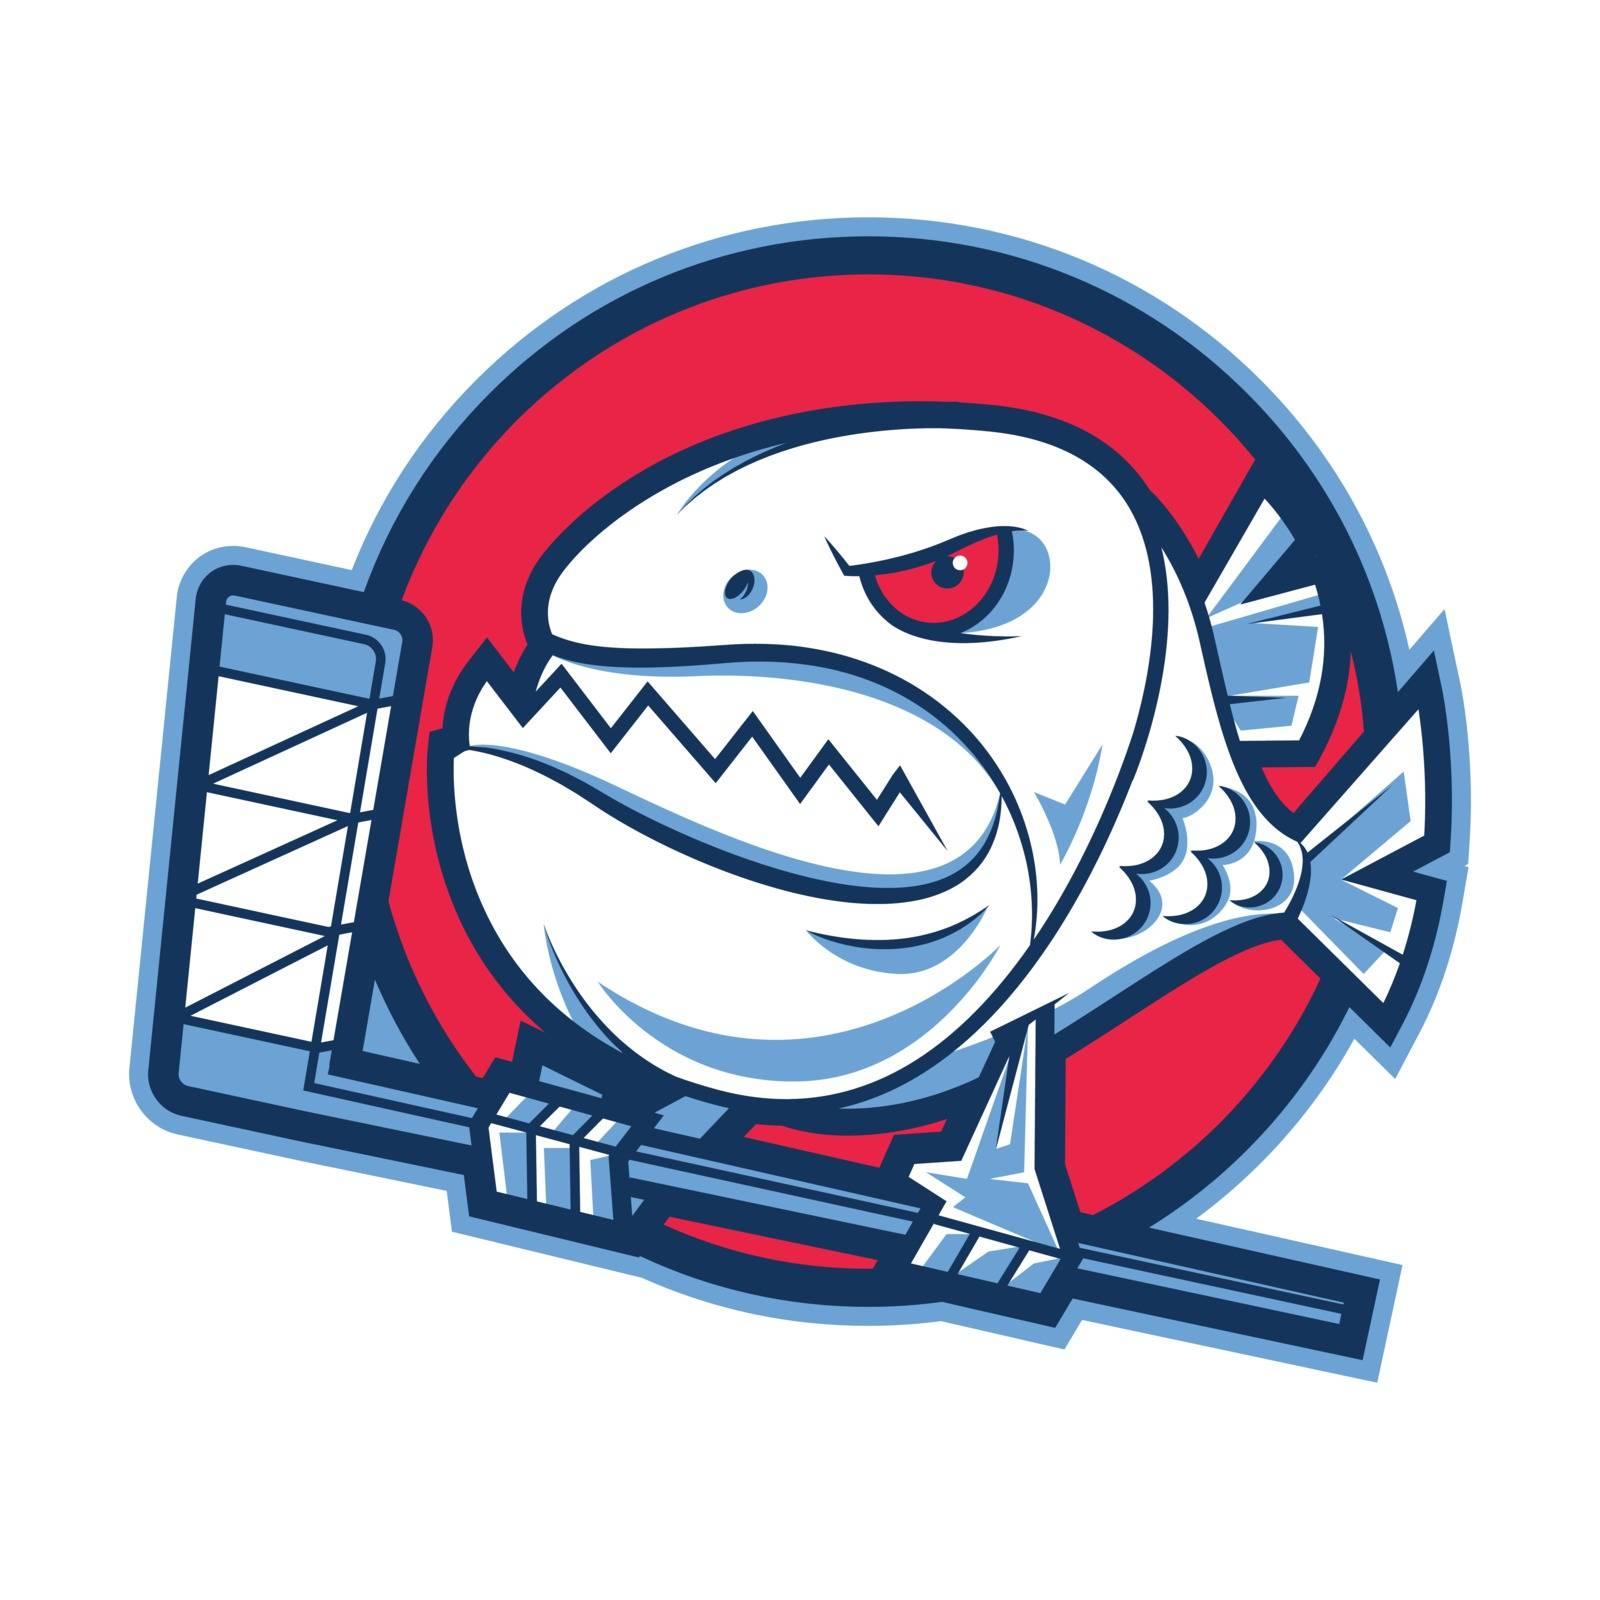 Illustration emblem aggressive piranha holds hockey stick, format EPS 10